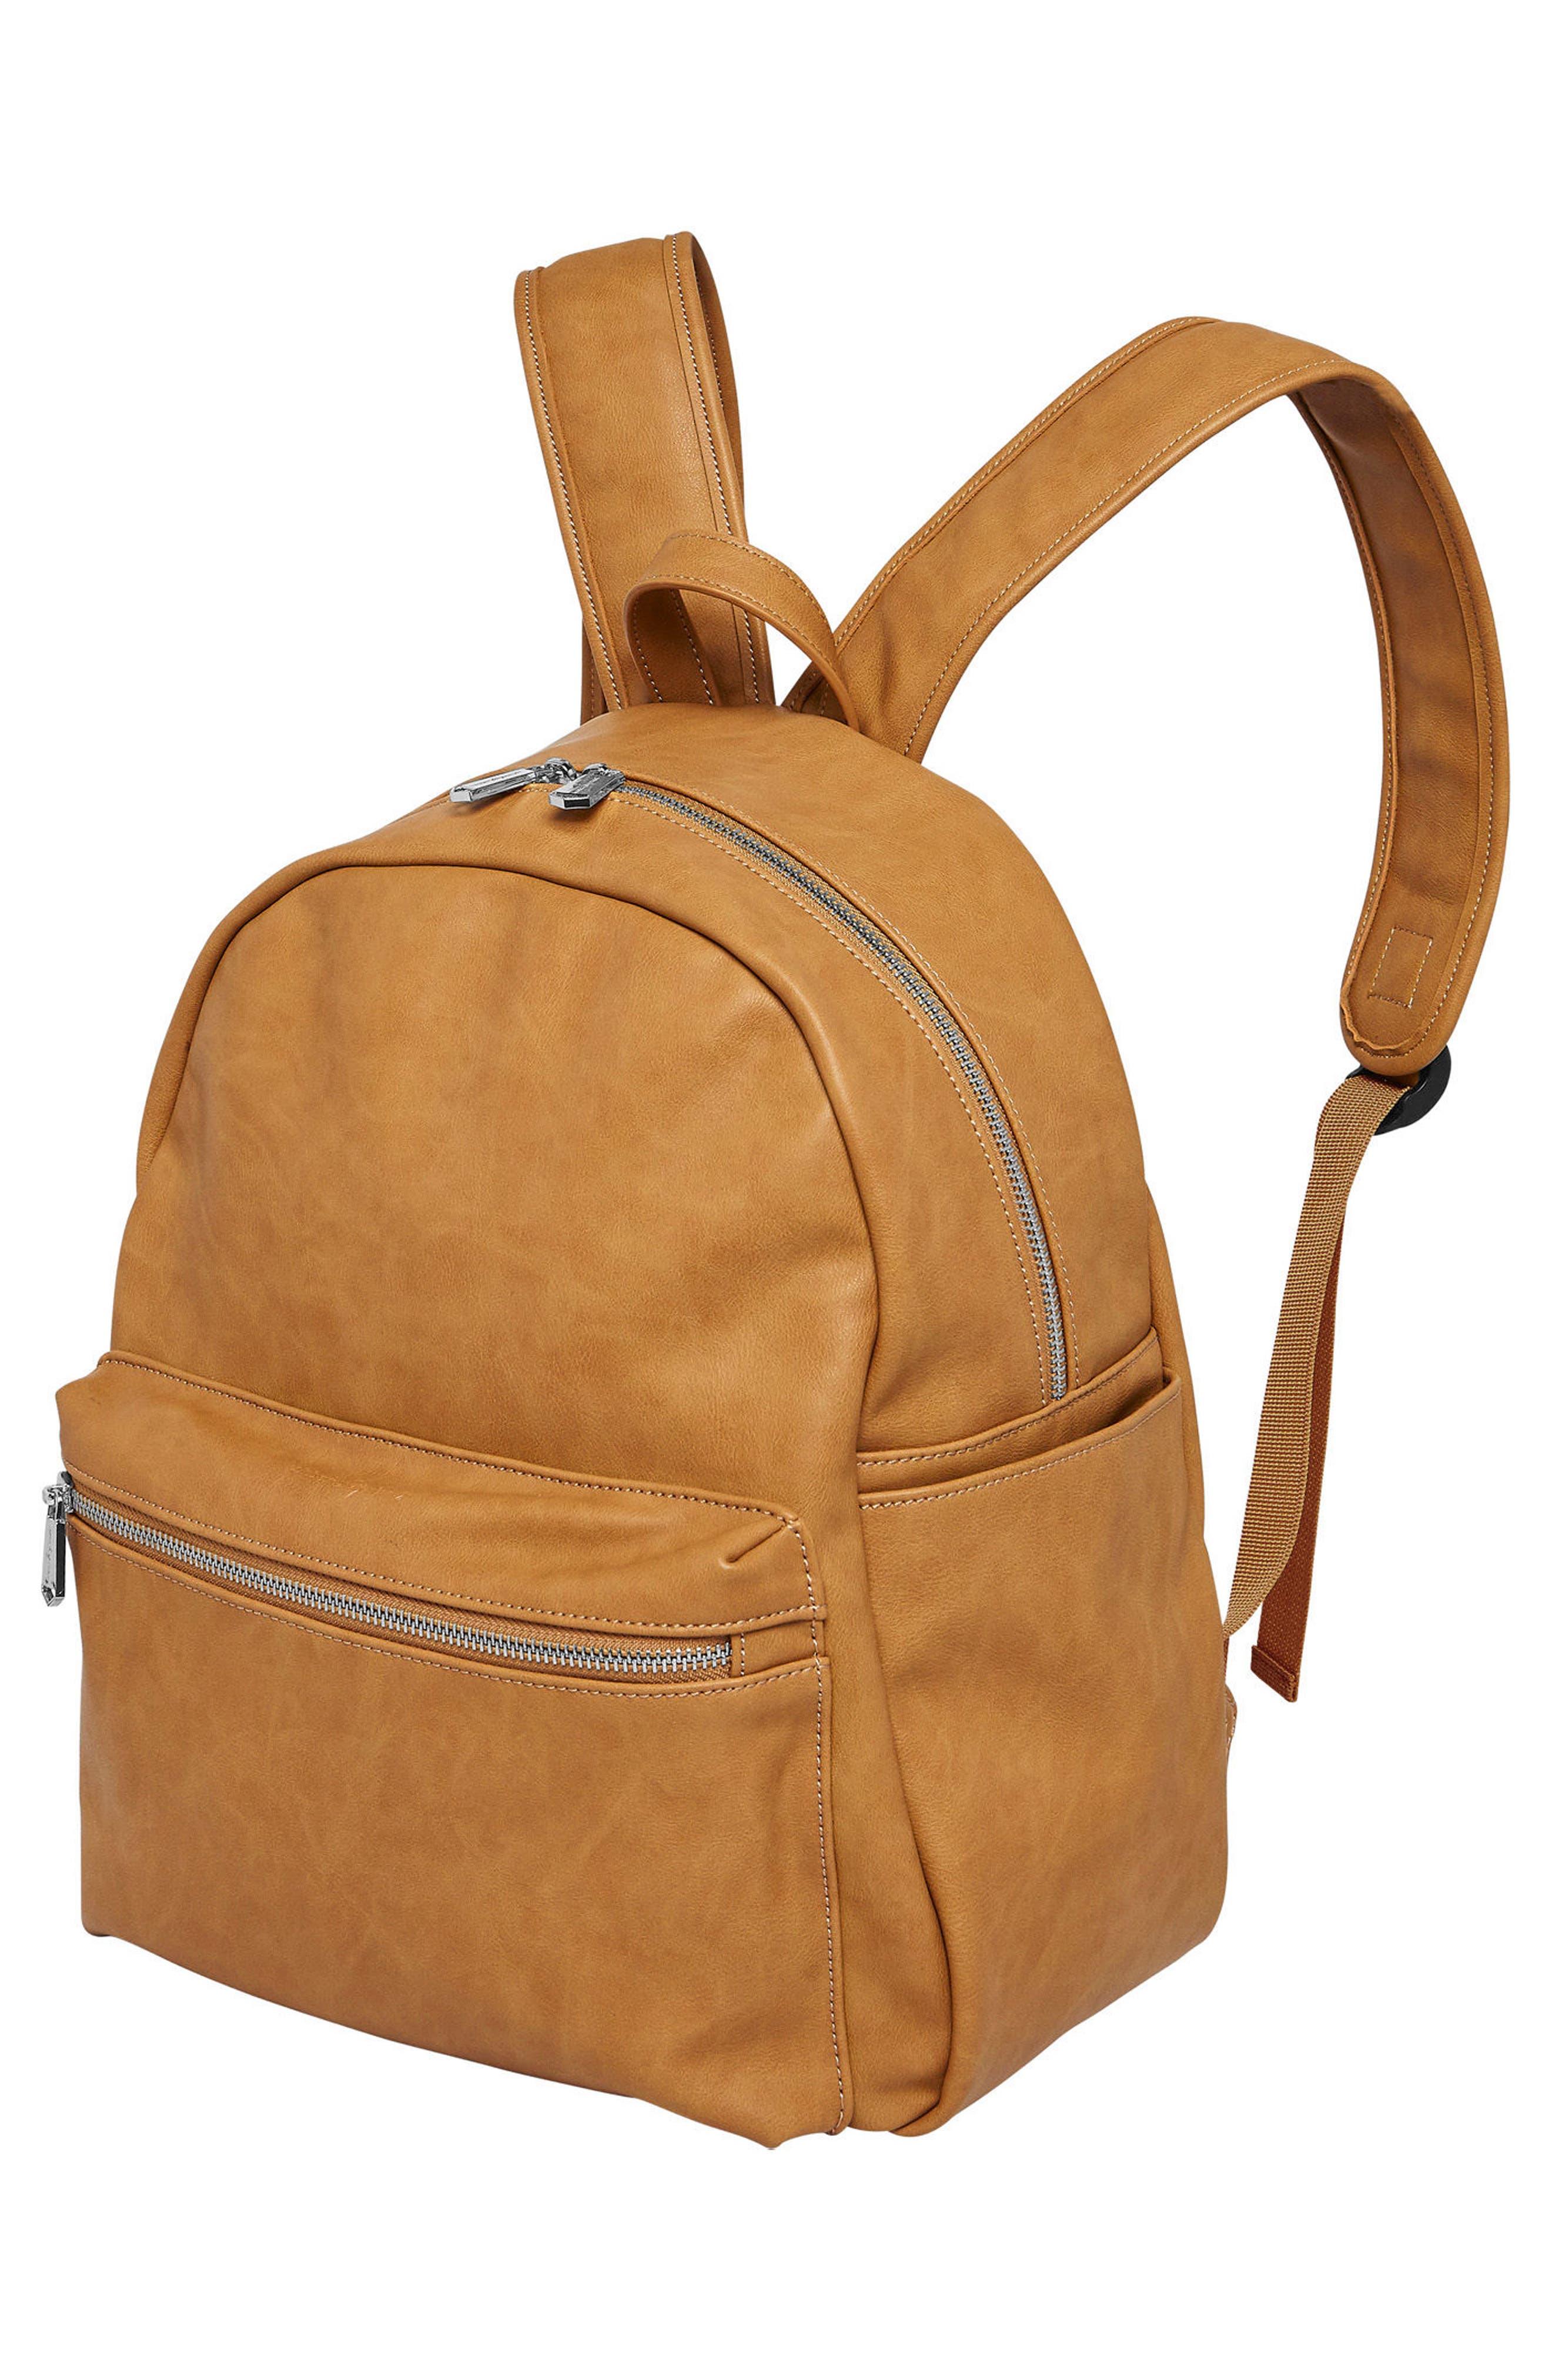 Practical Vegan Leather Backpack,                             Alternate thumbnail 4, color,                             Camel